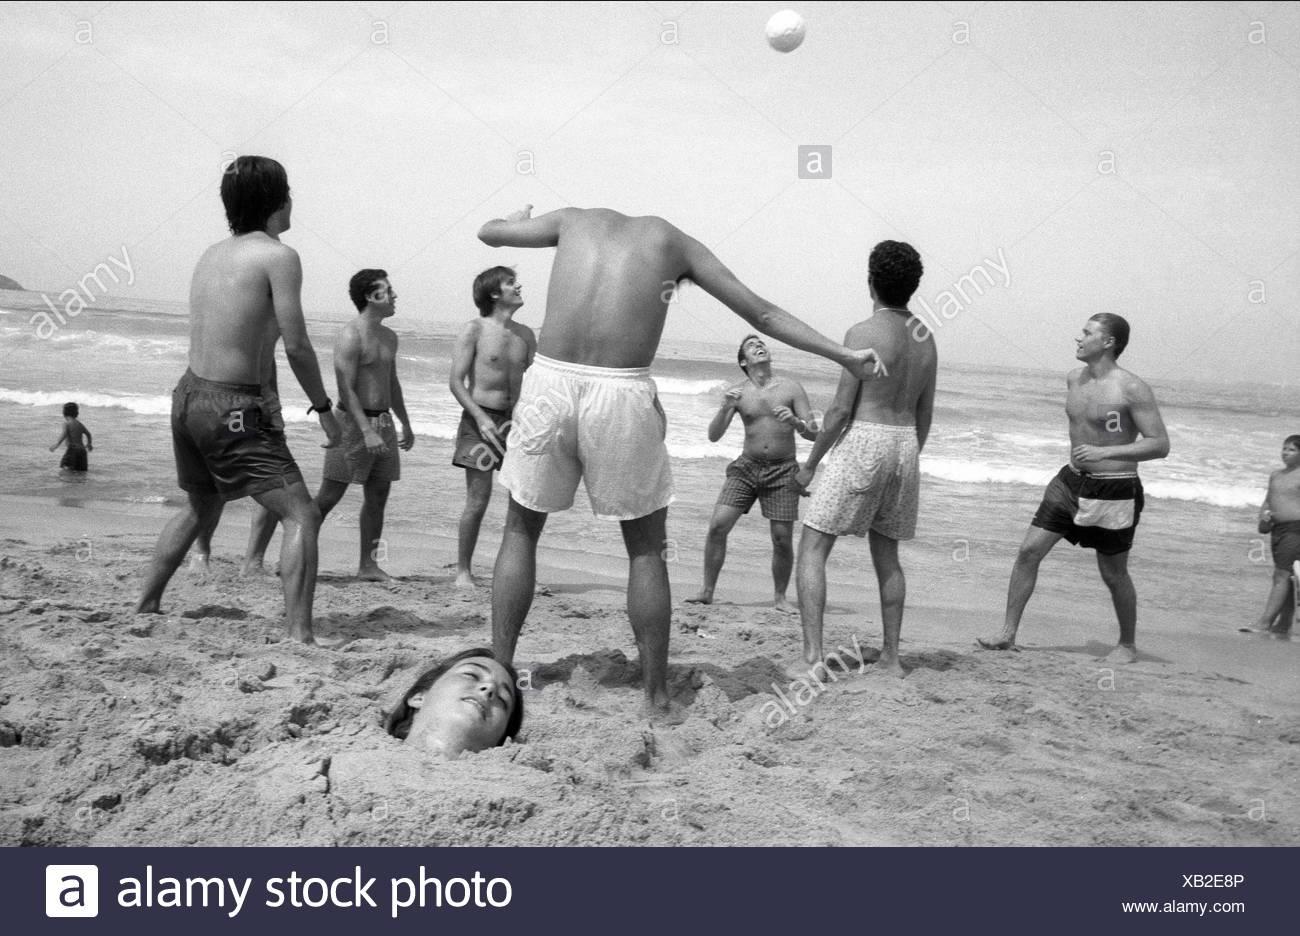 A headless man playing soccer on Algeciras beach. - Stock Image